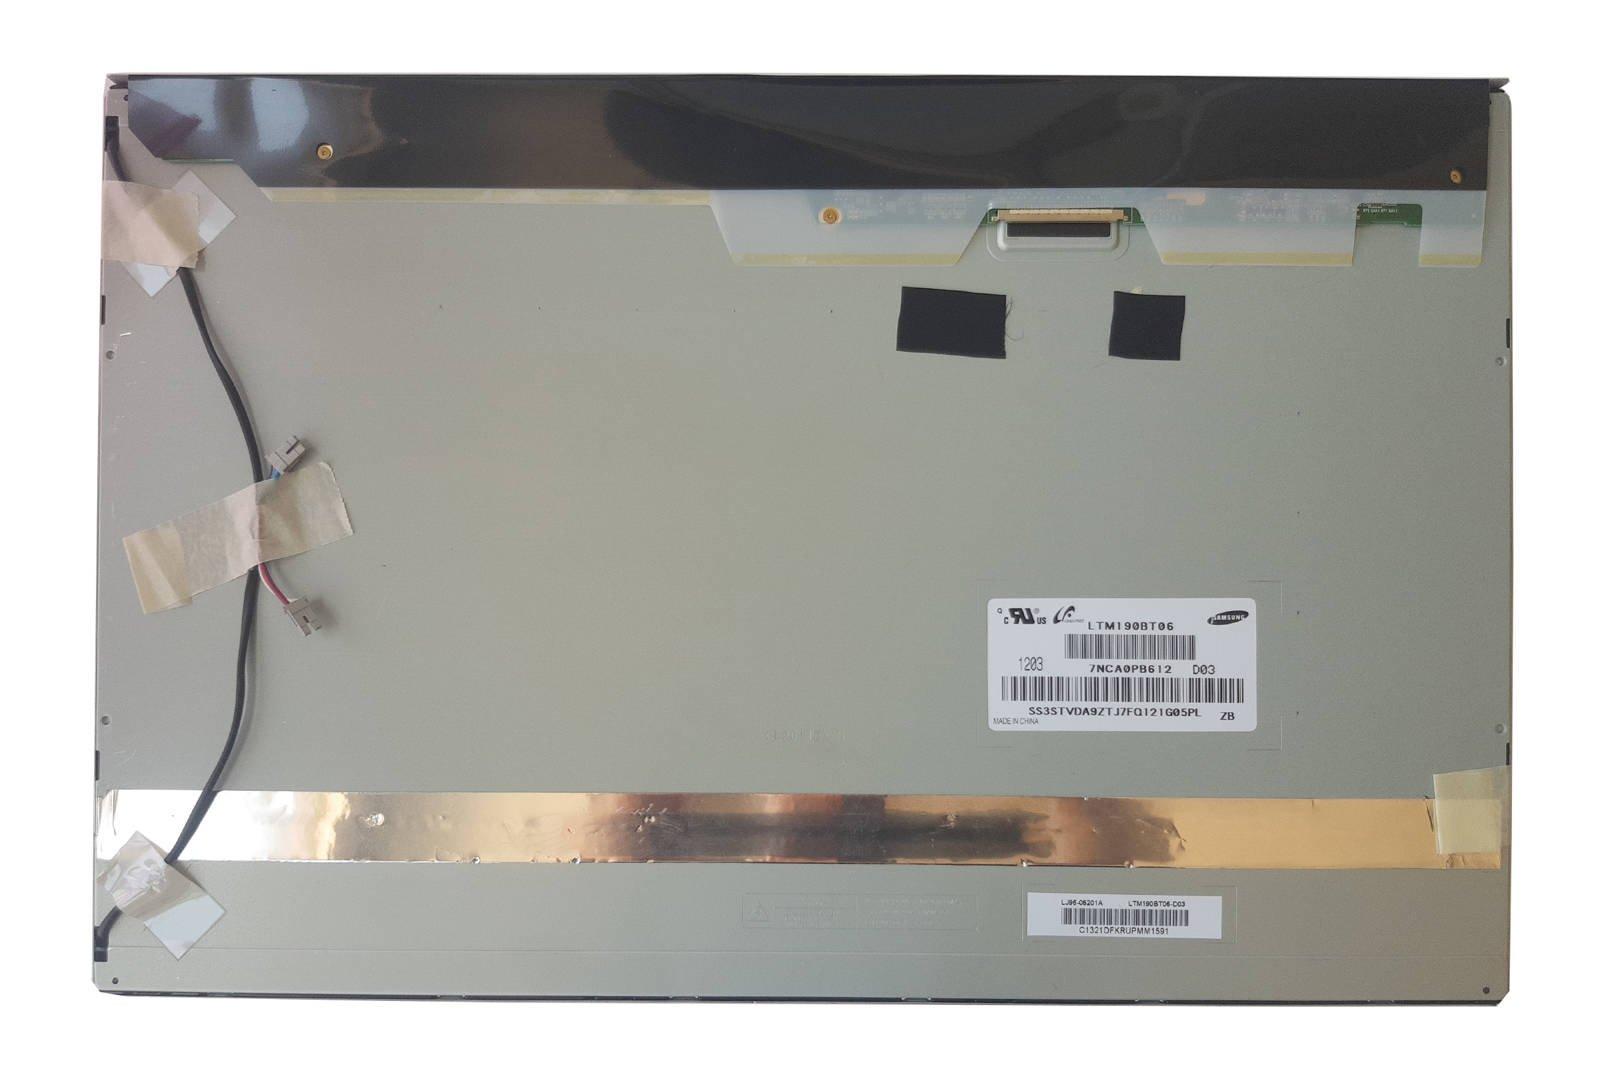 Display Panel Screen Samsung 19' LTM190BT06